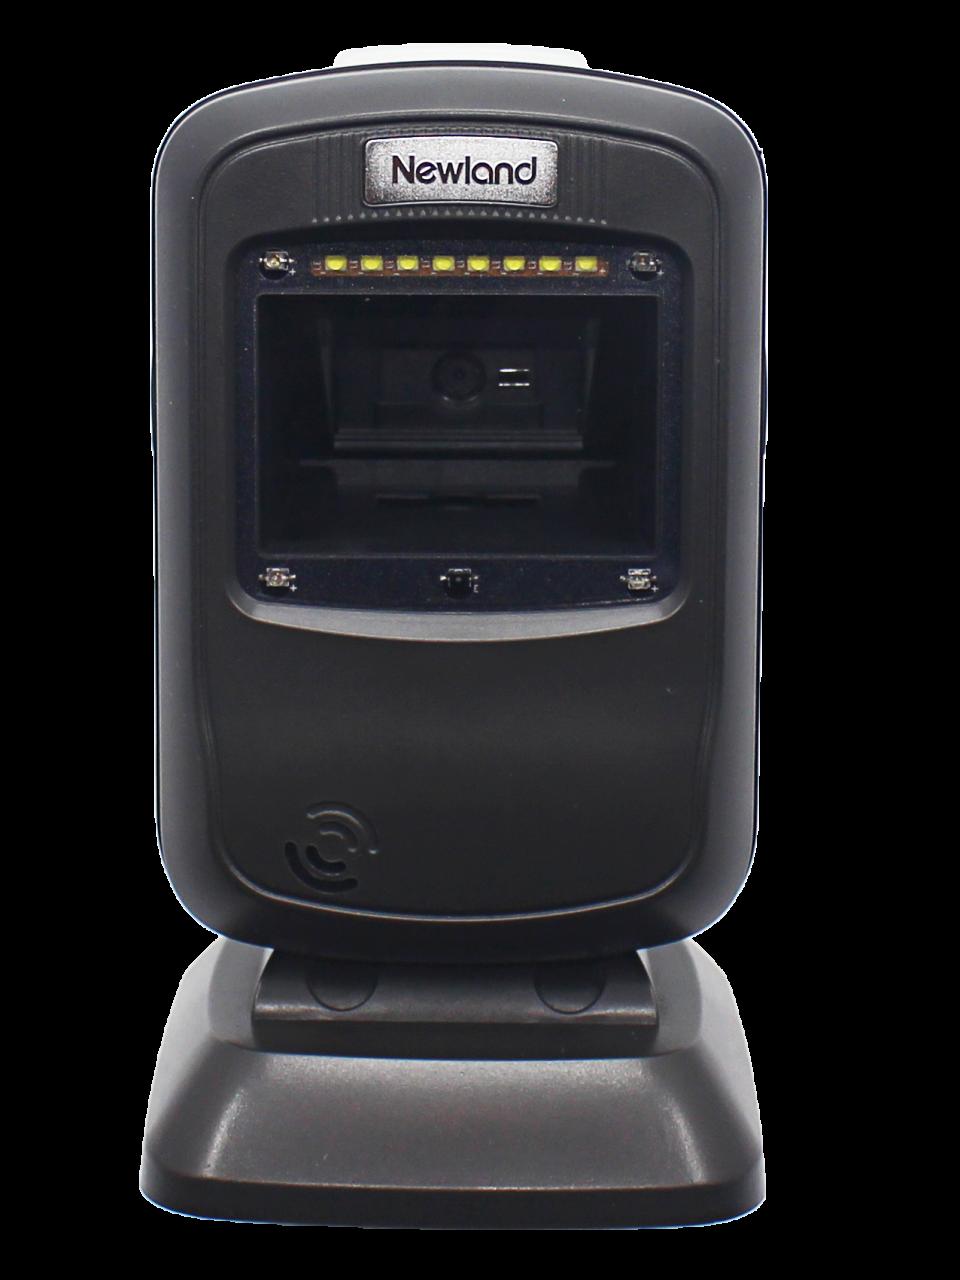 NewlandFR4080